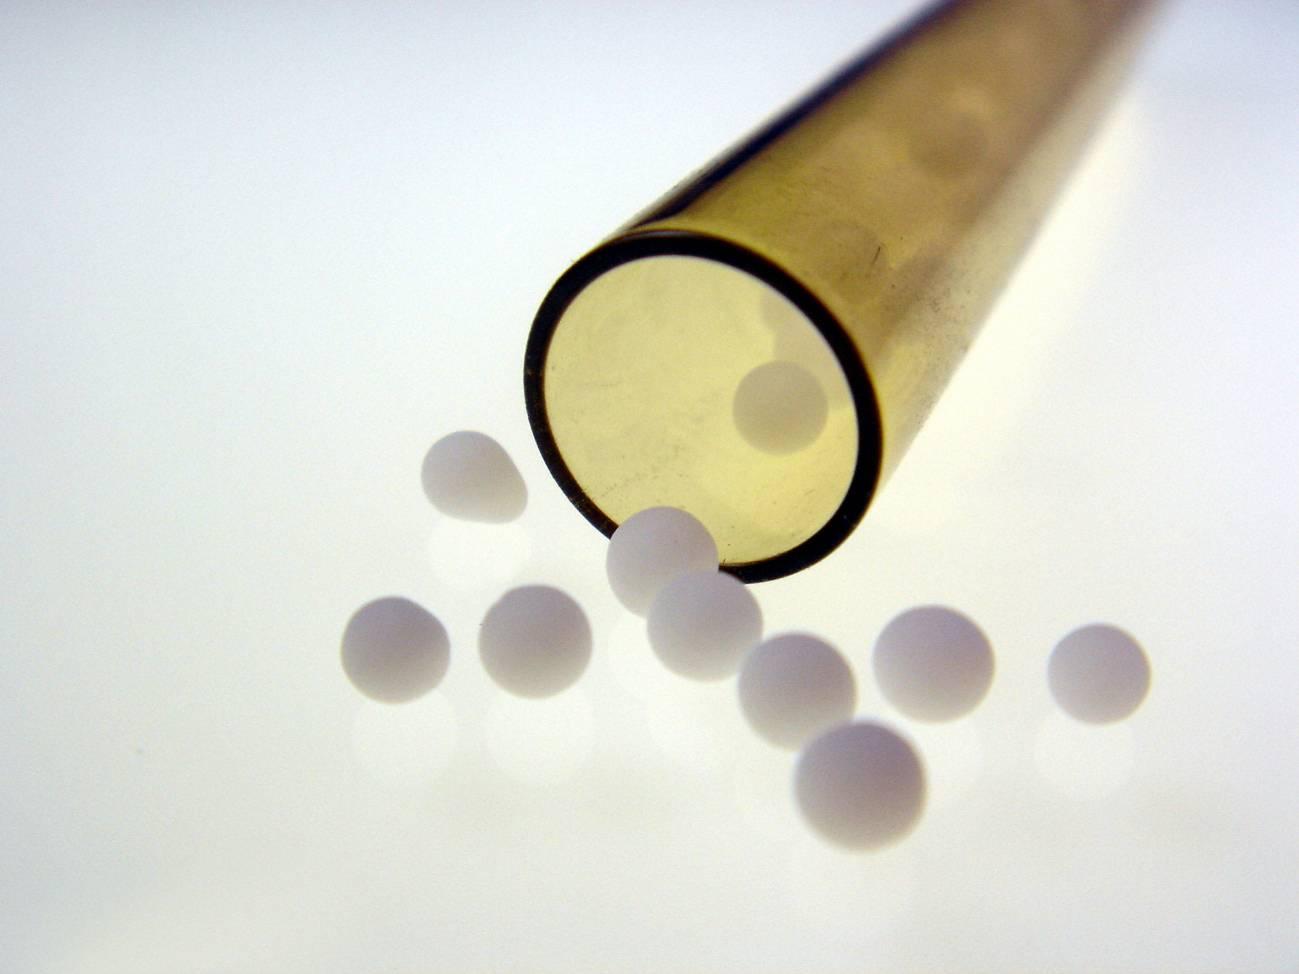 Producto homeopático